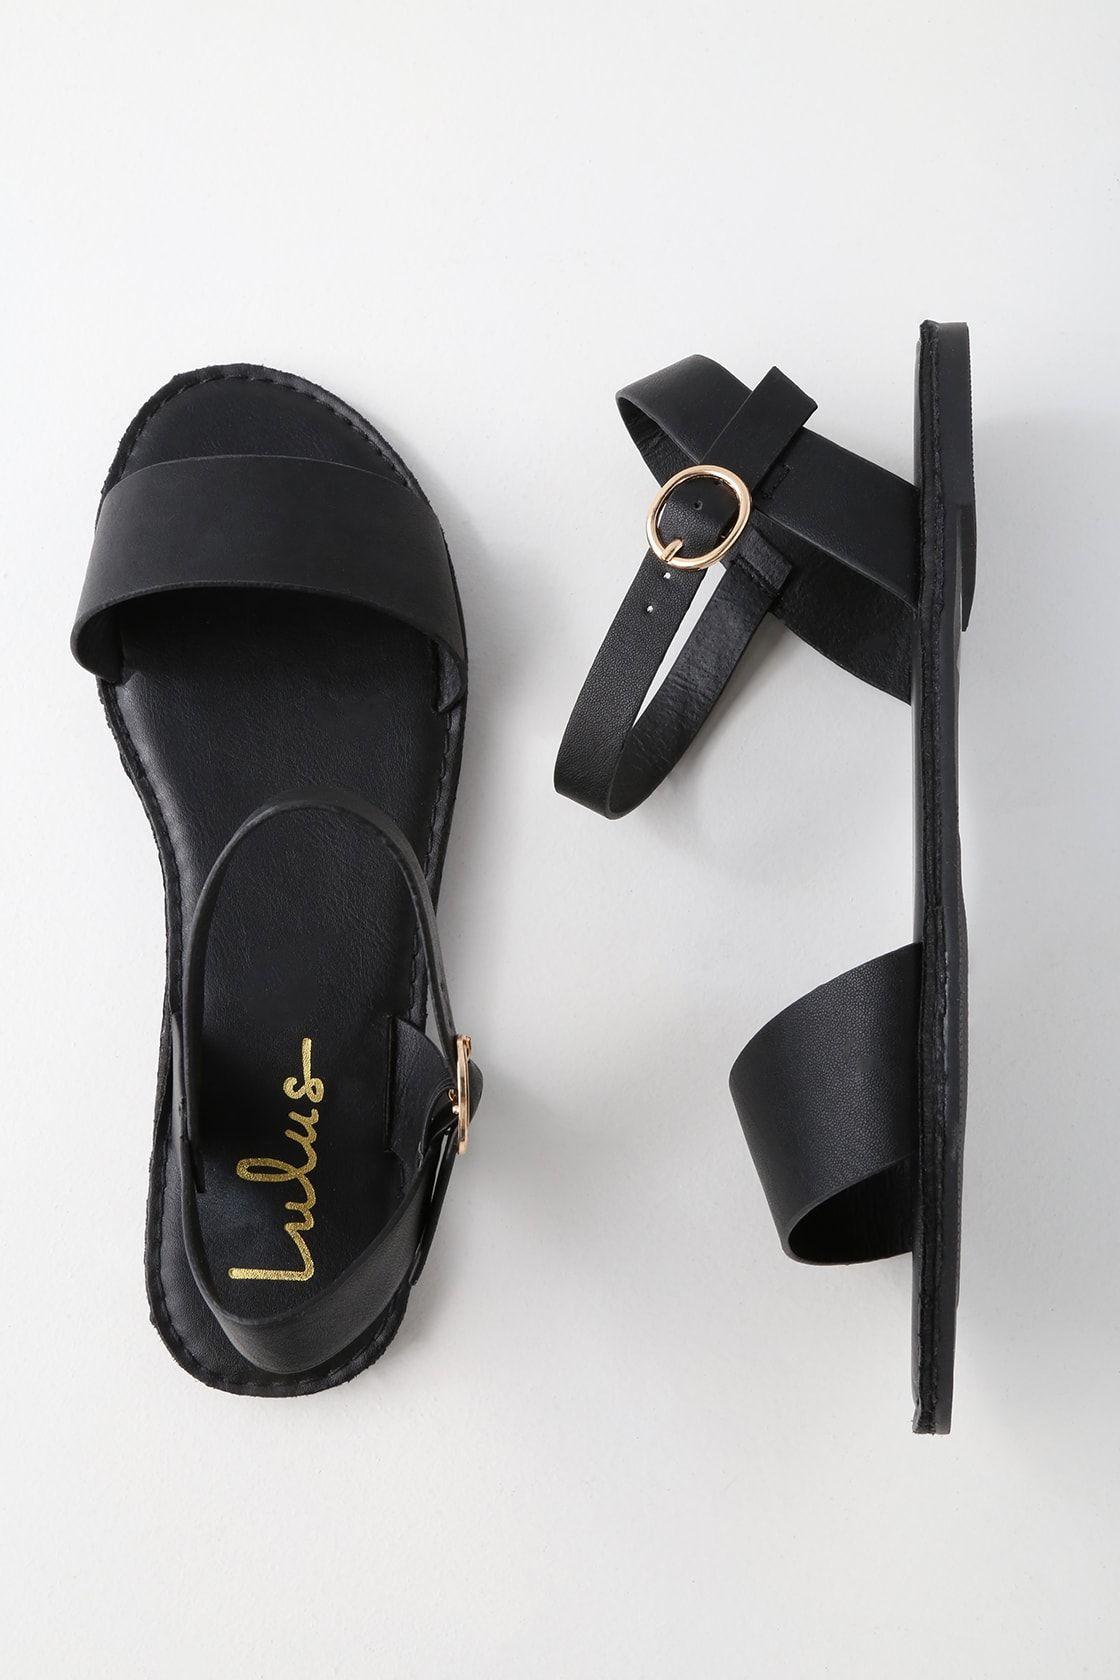 Hearts And Hashtags Black Flat Sandals Black Sandals Flat Black Sandals Dressy Womens Sandals [ 1680 x 1120 Pixel ]